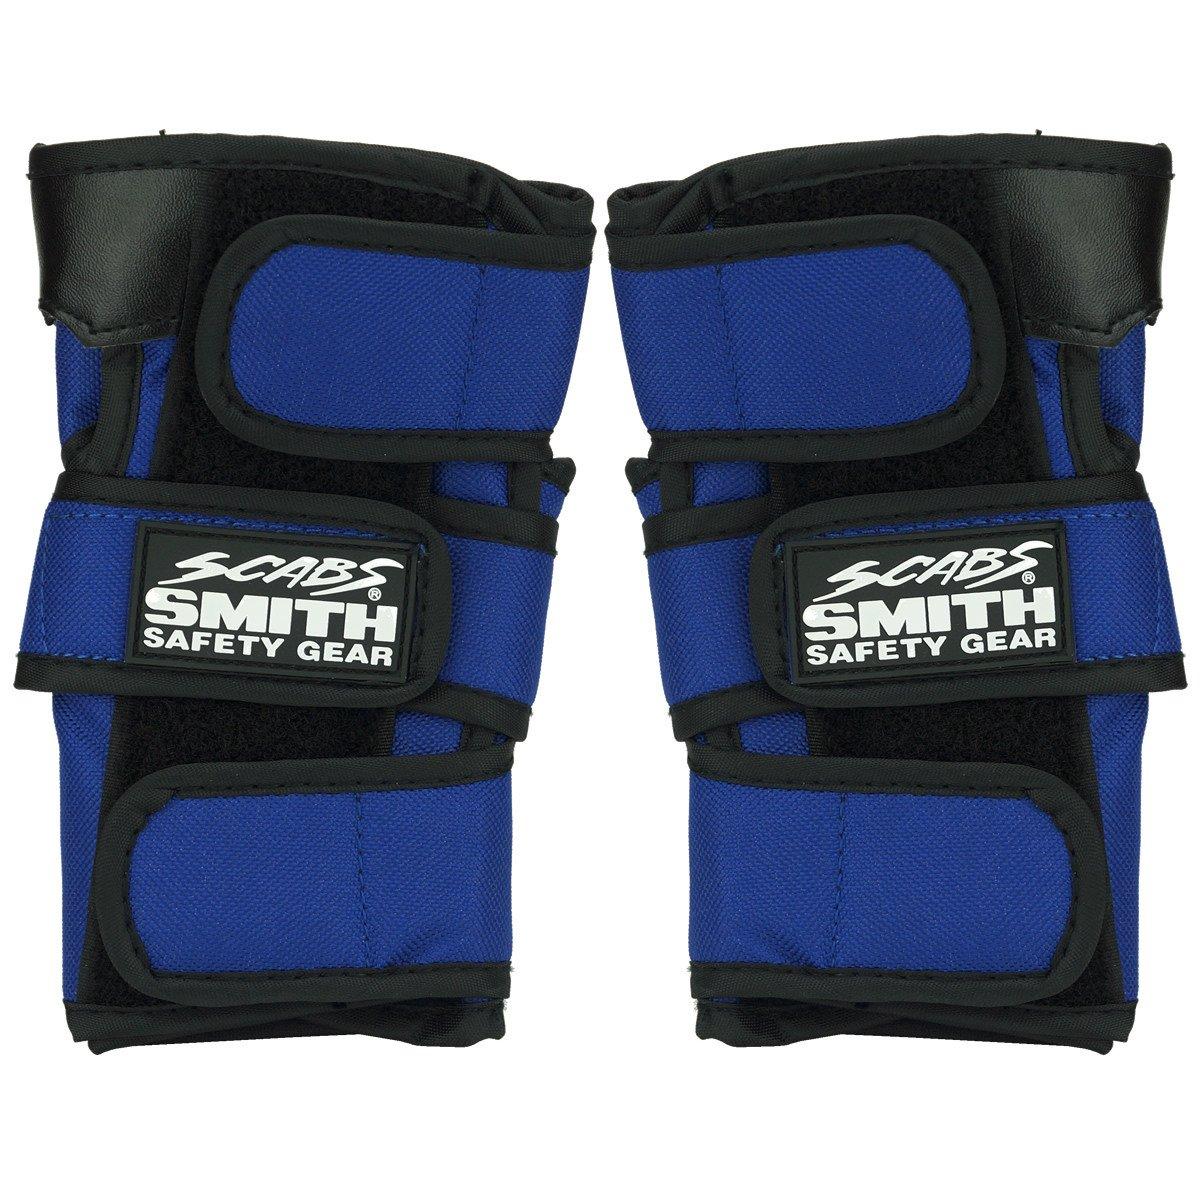 smith-scabs-wrist-guard-blue.jpg